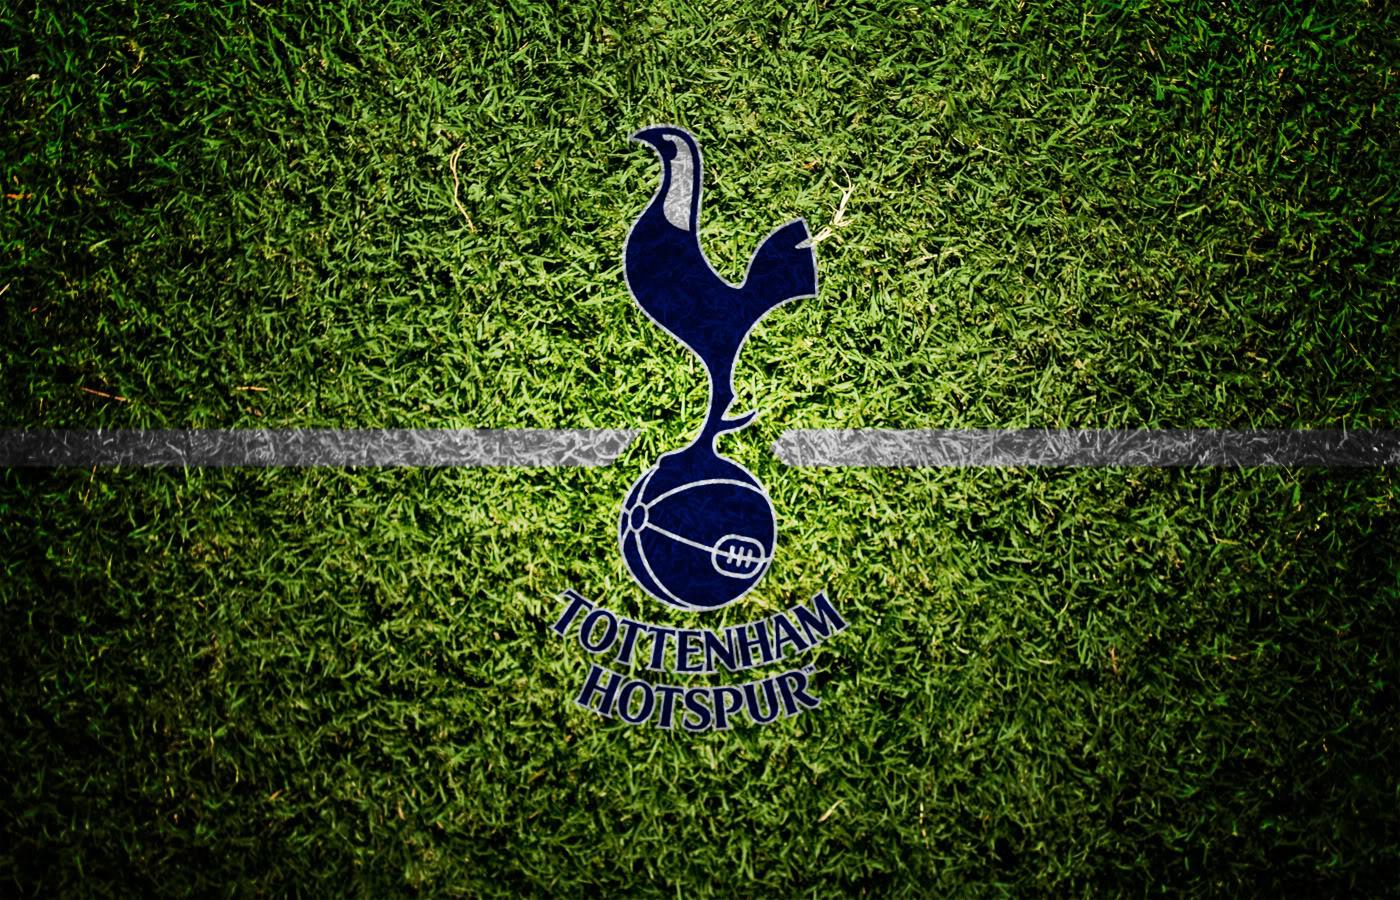 Tottenham Wallpaper Iphone 6 Tottenham Hotspur Football Wallpaper Backgrounds And Picture